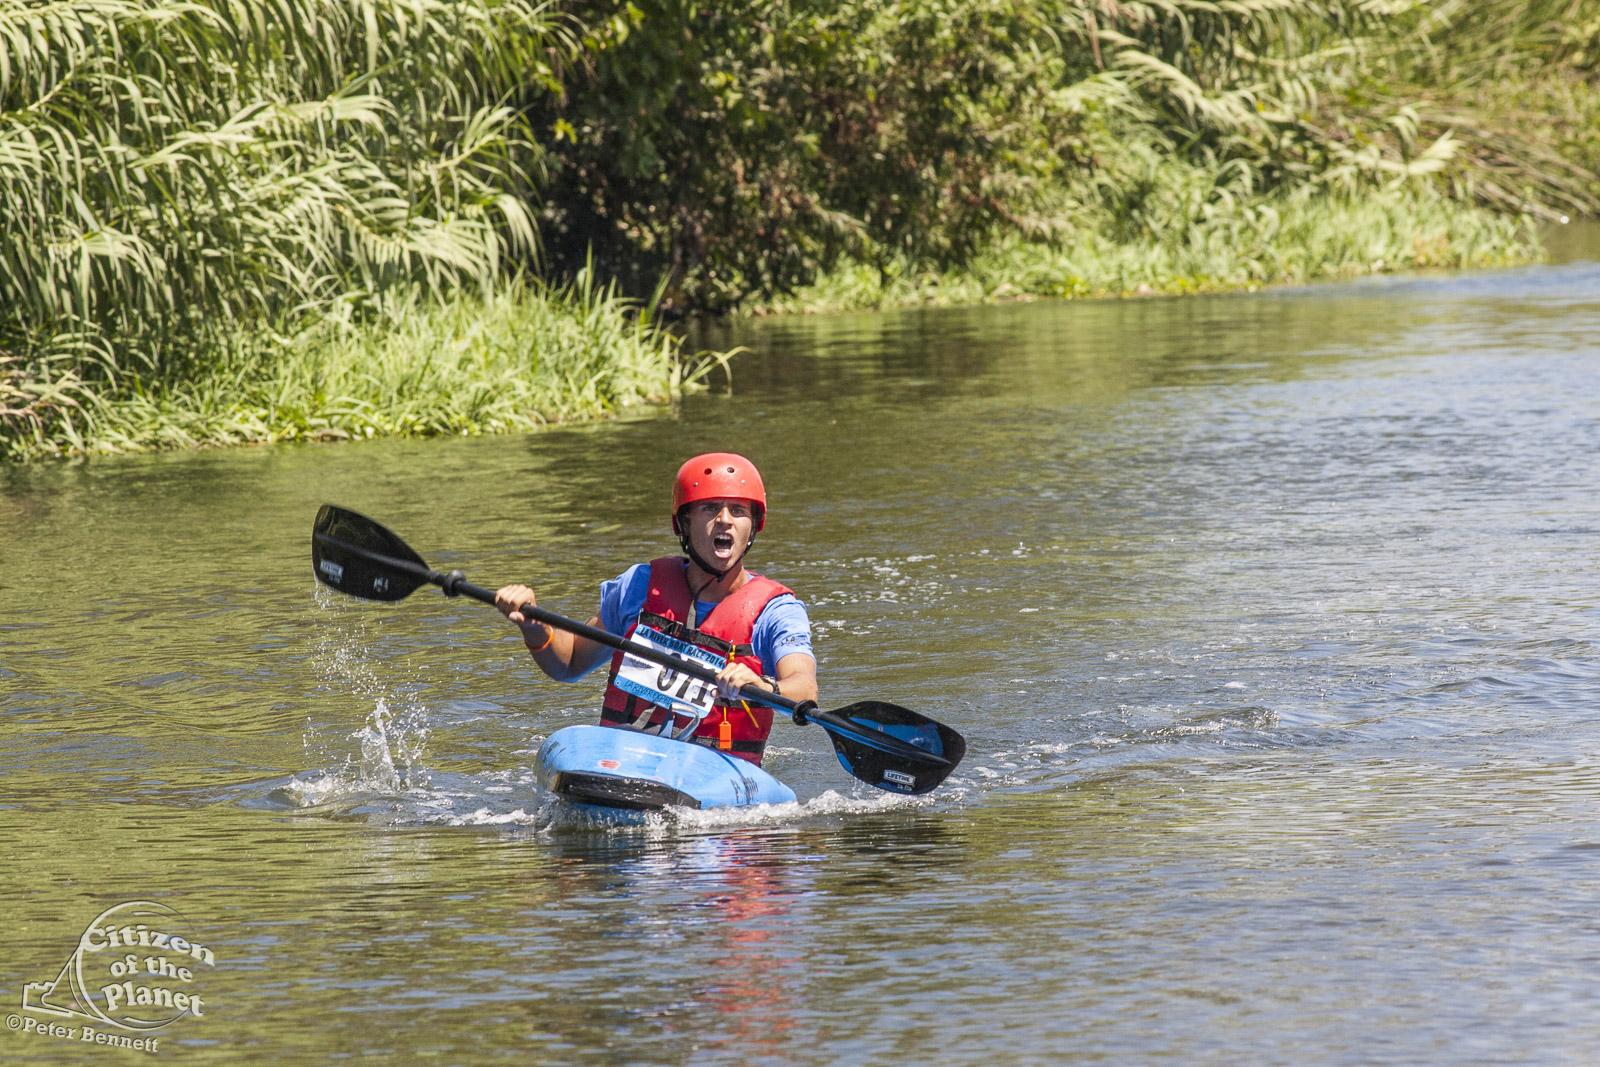 US_CA_48_3852_la_river_boat_race.jpg